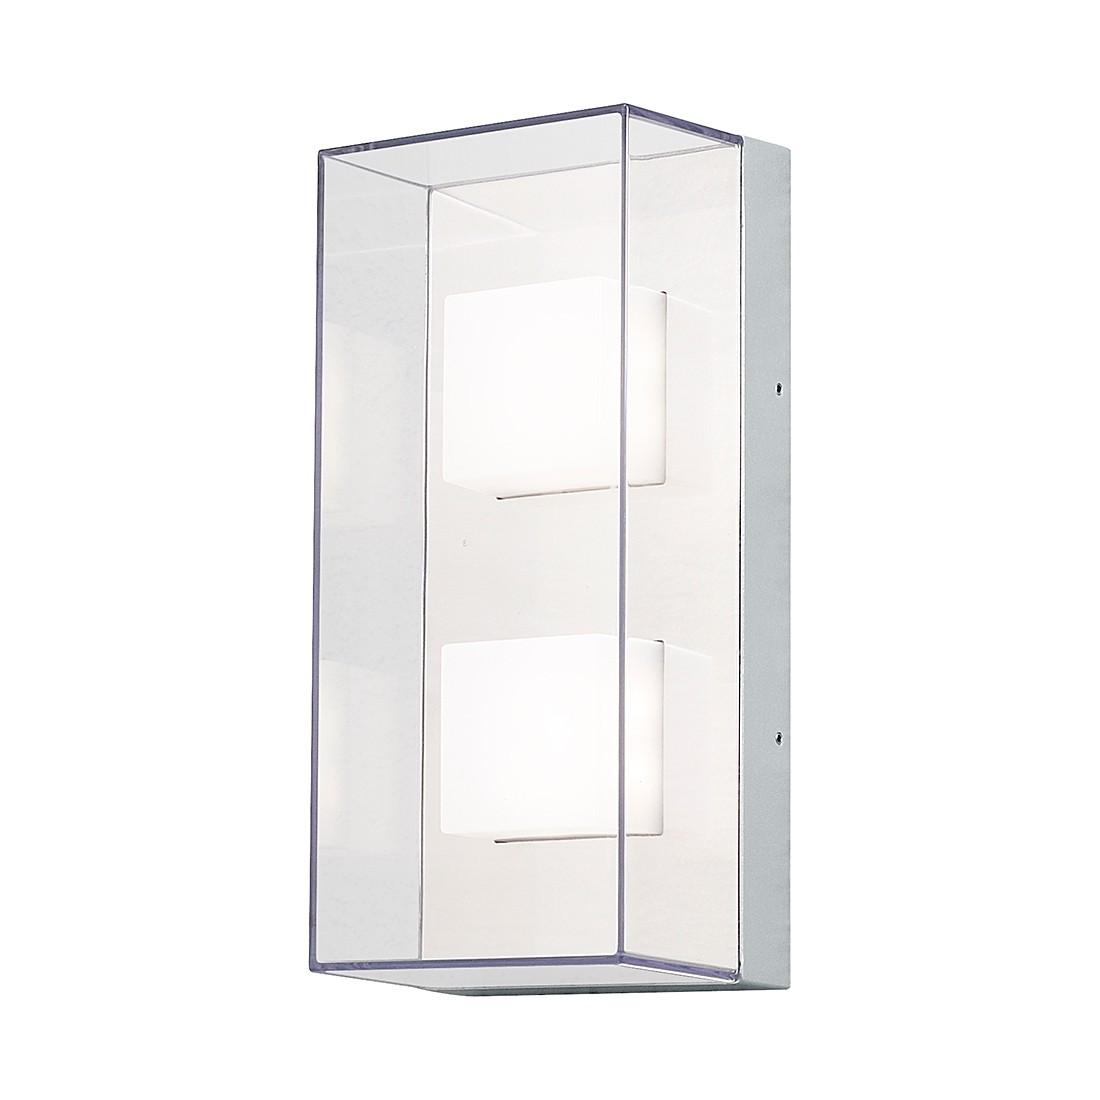 EEK A+, LED Wand- Deckenleuchte Sanremo - Aluminium/Glas - 8-flammig, Konstsmide